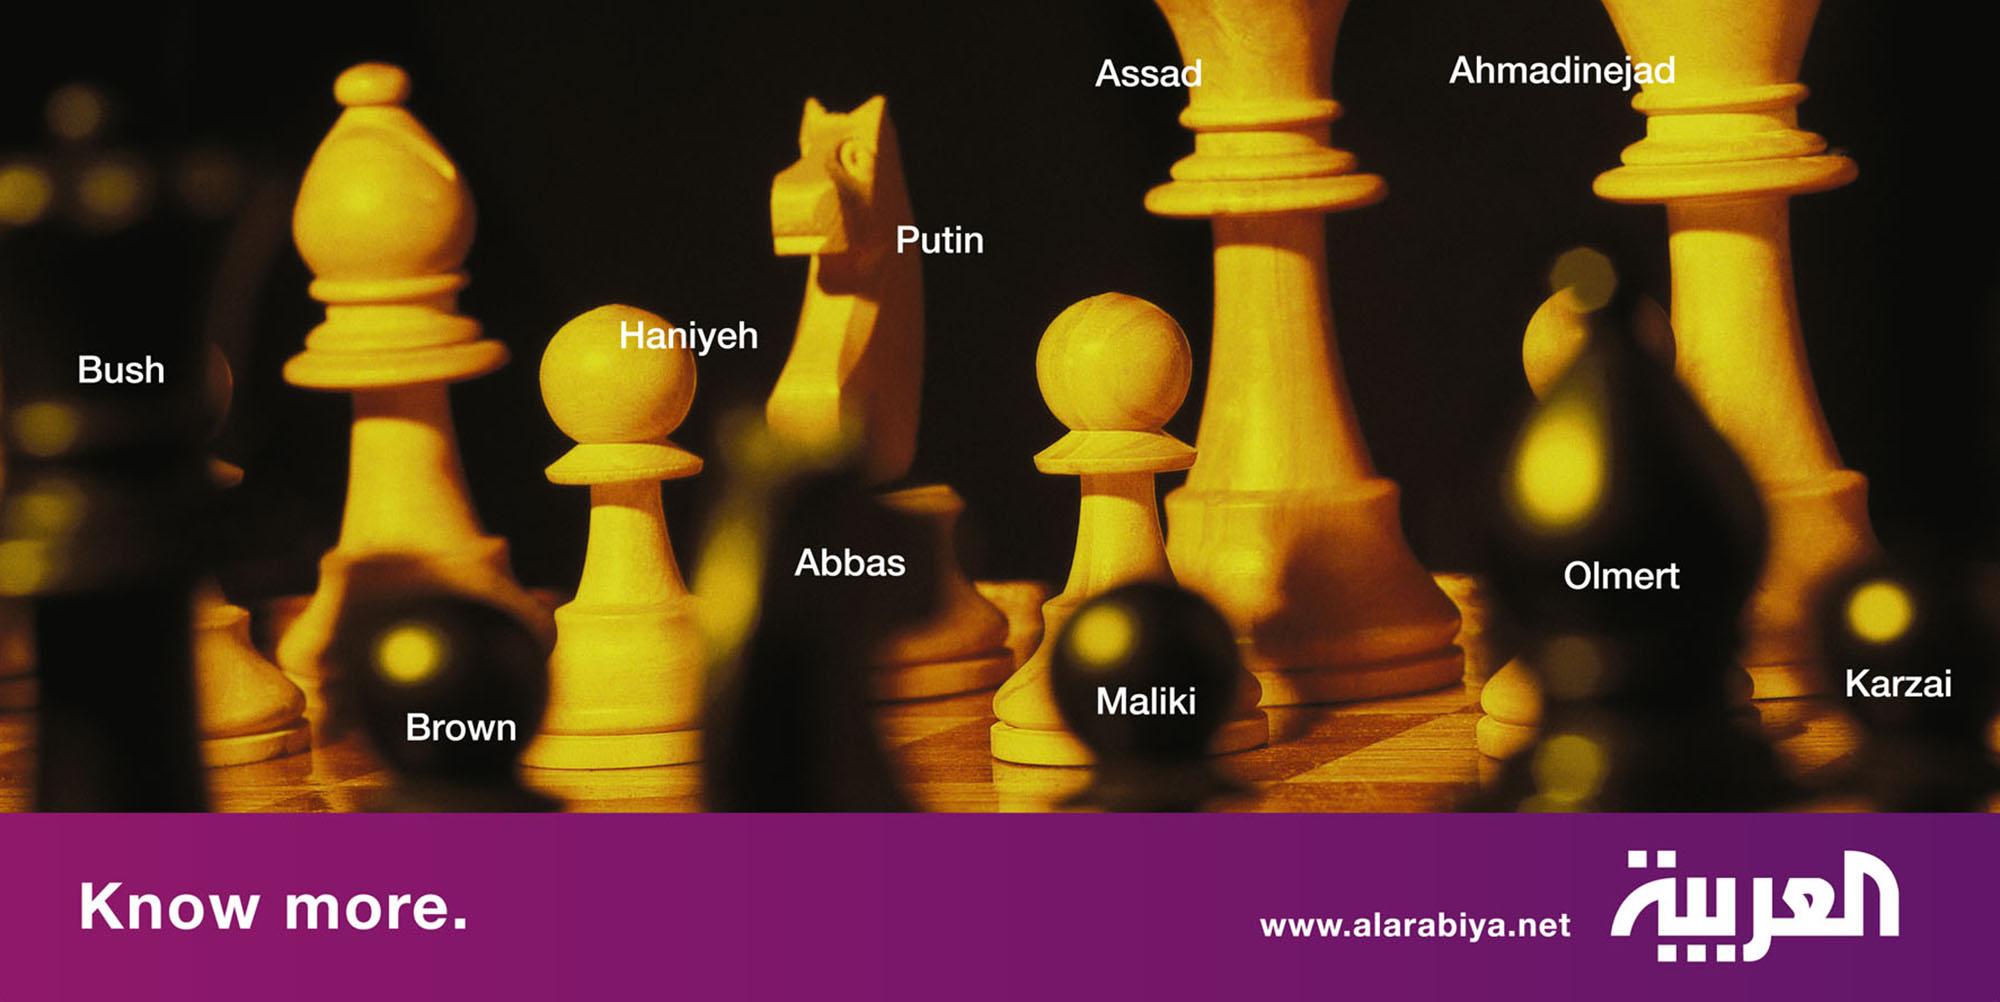 Al-Arabiya News 'Chess'